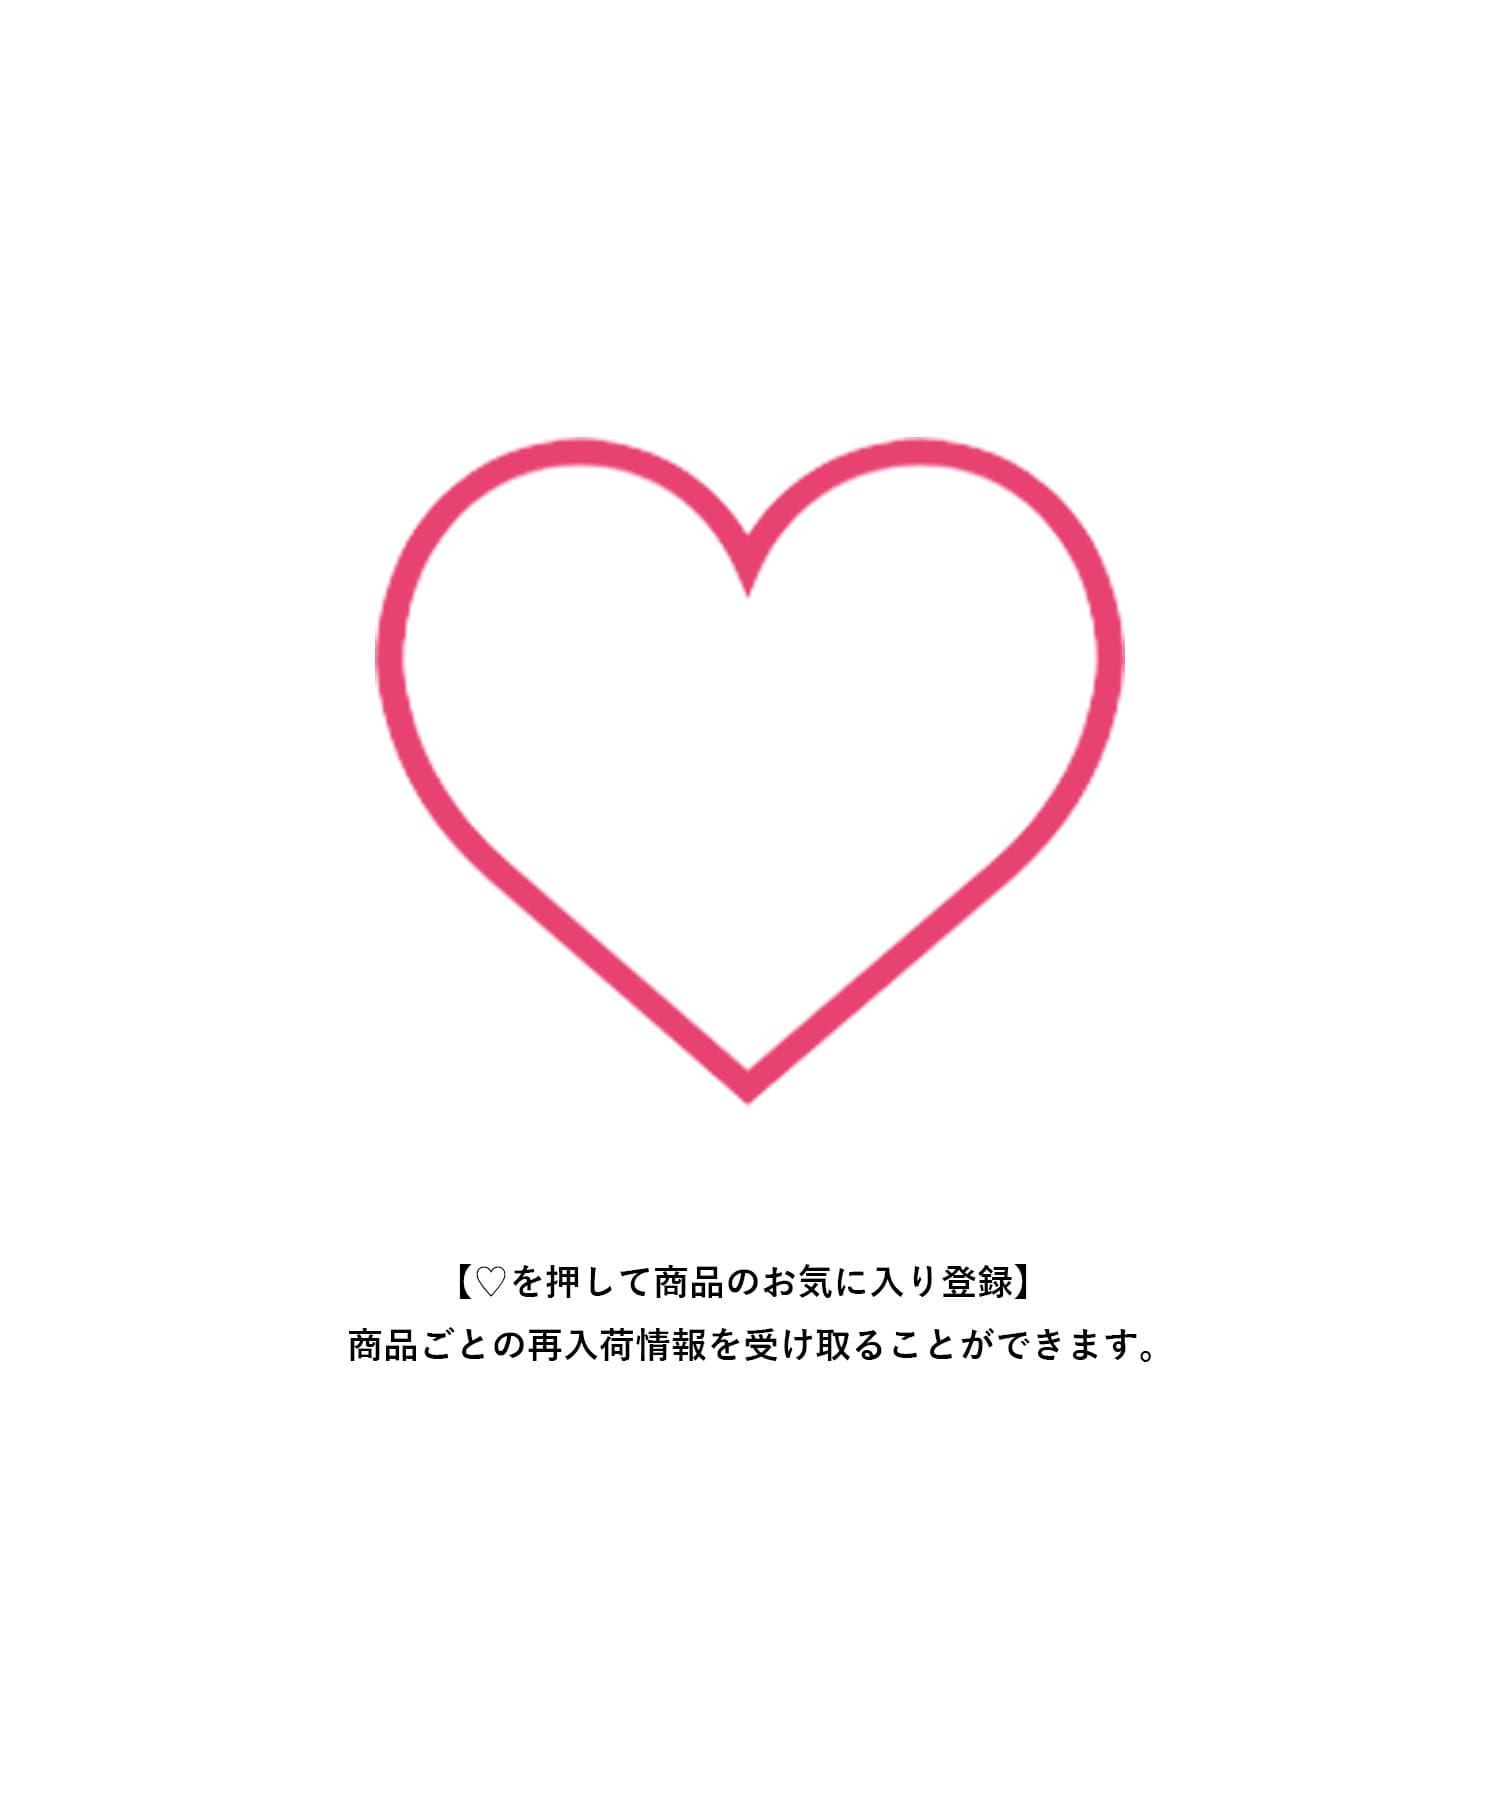 COLLAGE GALLARDAGALANTE(コラージュ ガリャルダガランテ) 【PAPILLONNER/パピヨネ】プロテクトイヤリング